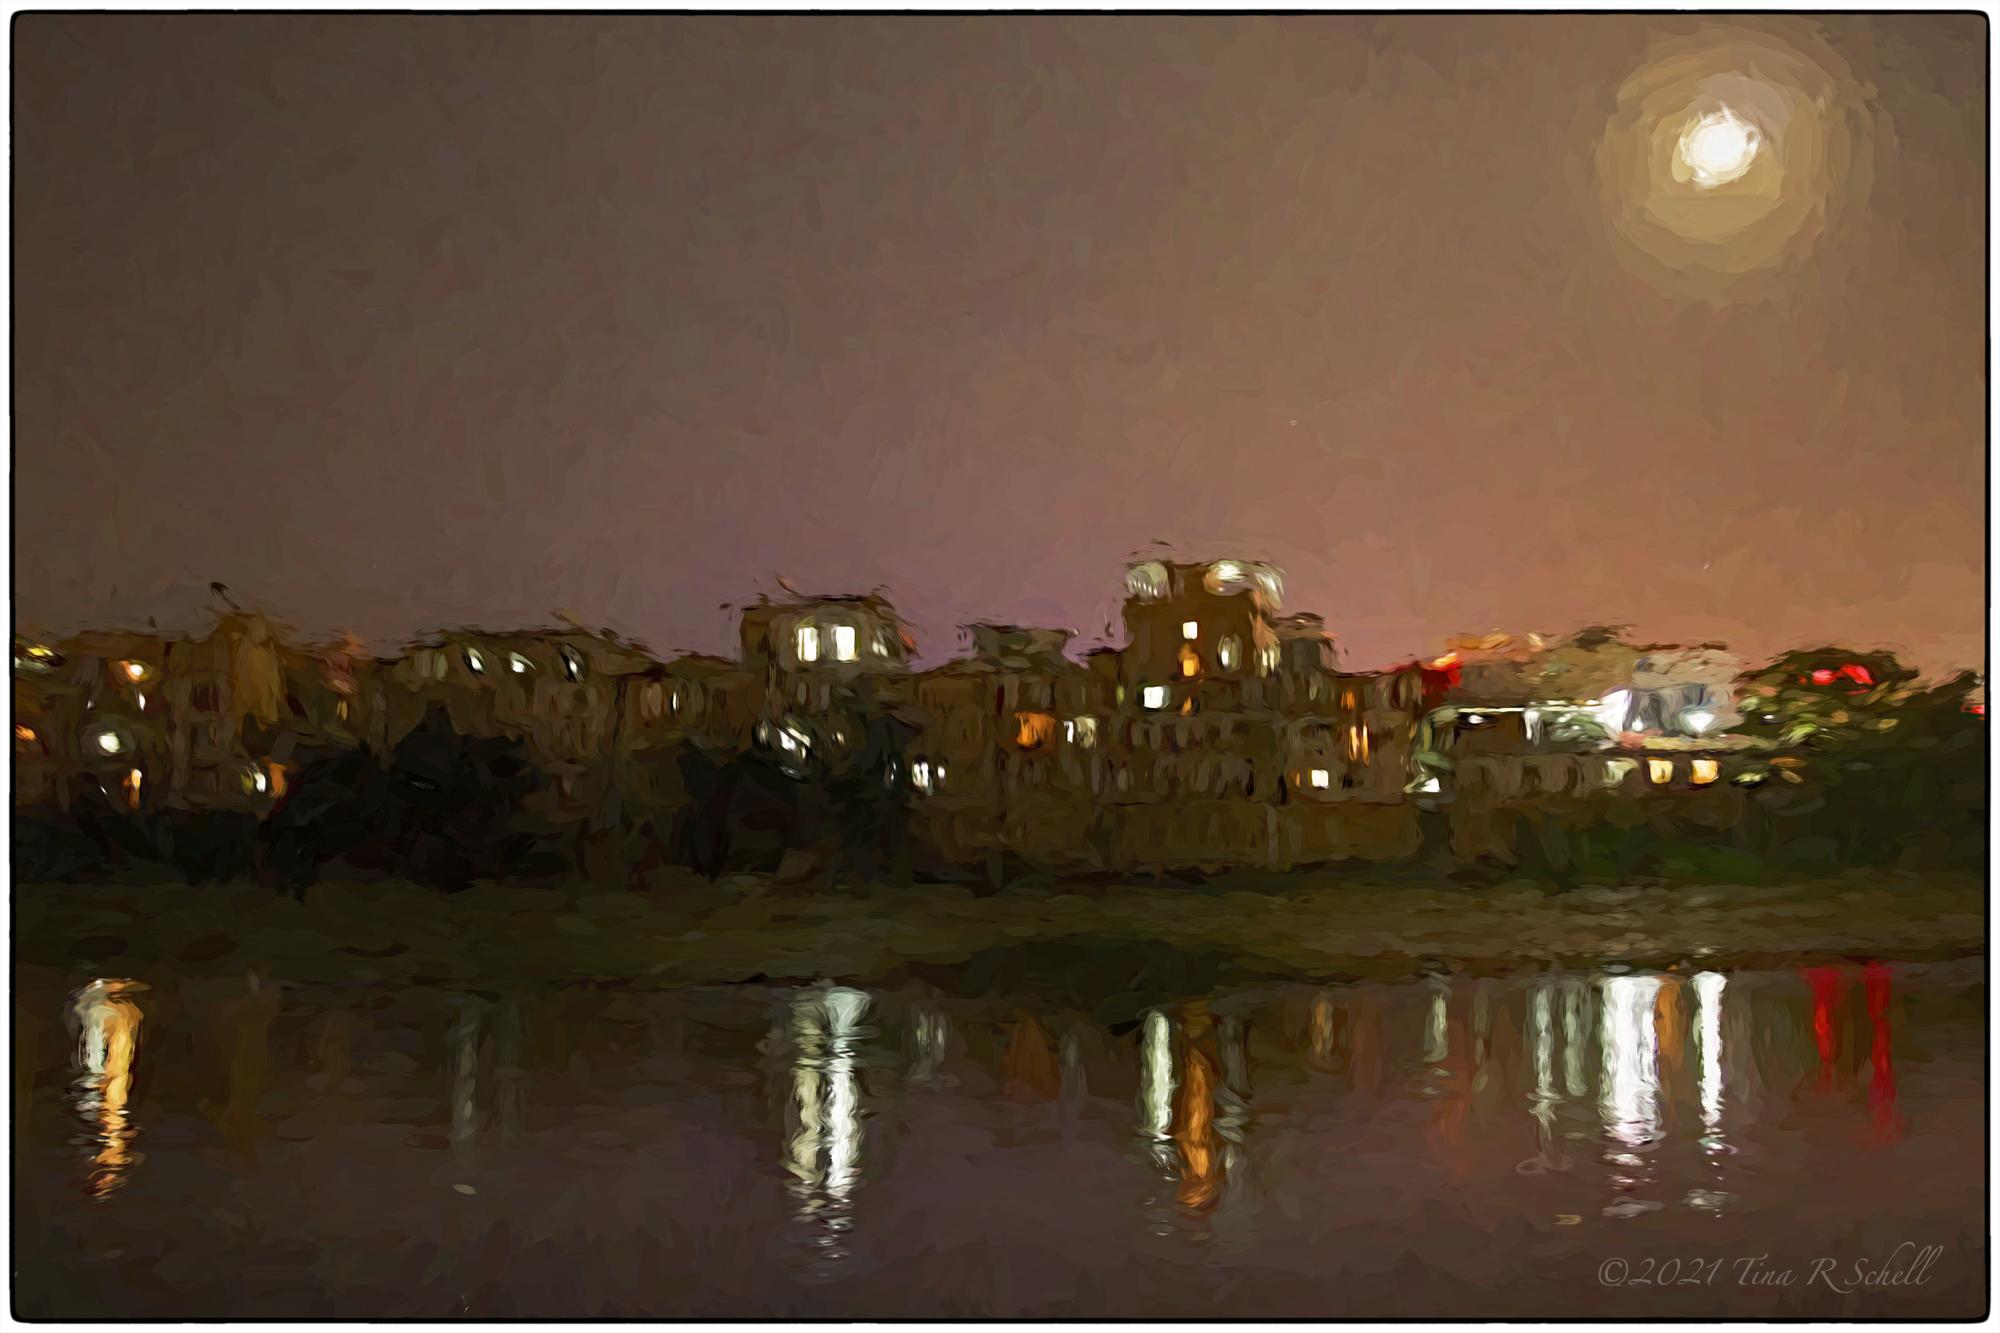 Nightfall, full moon, city lights